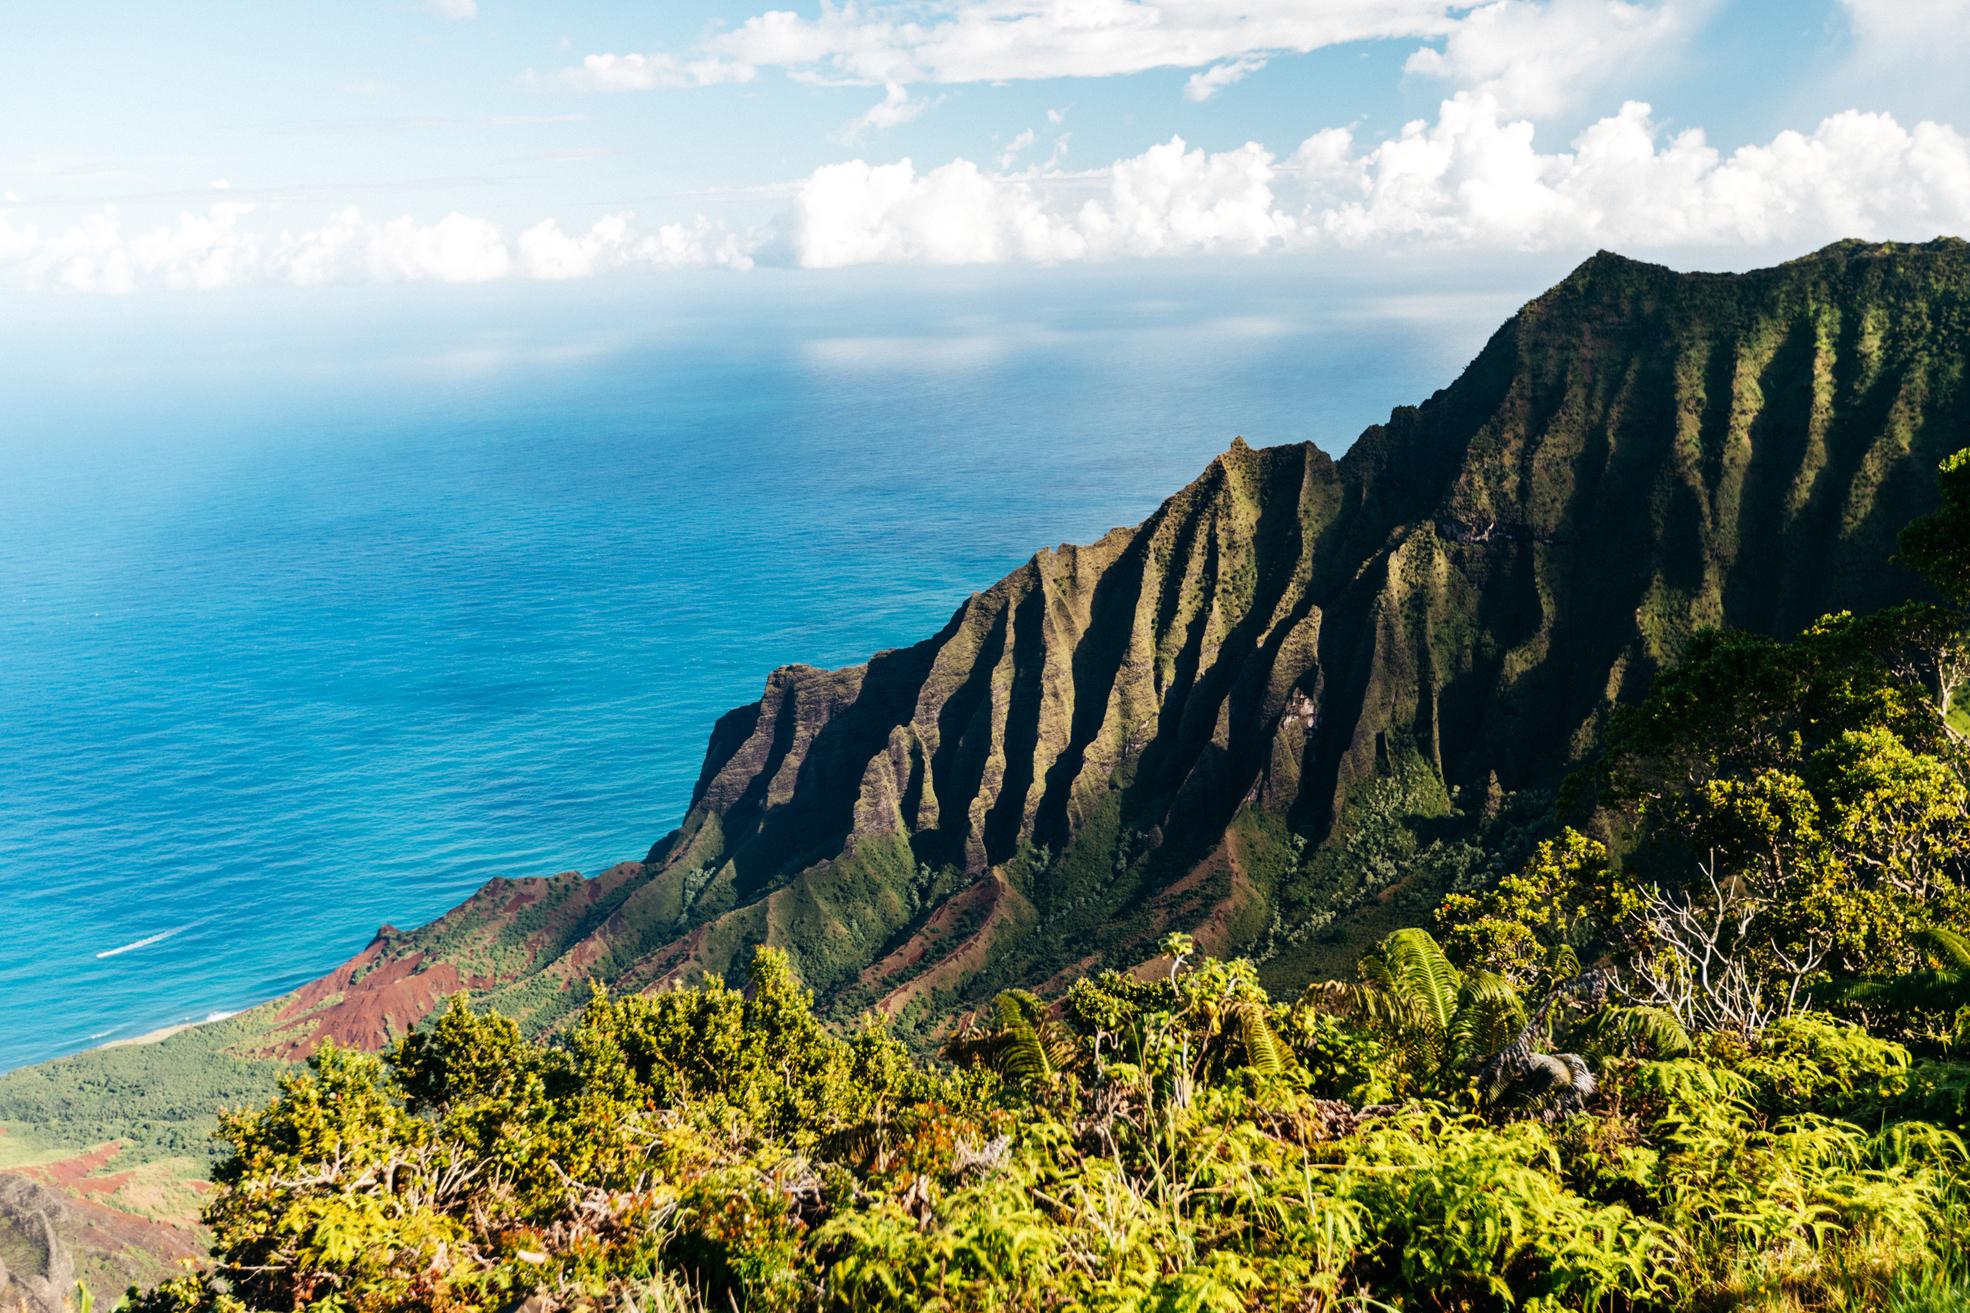 Credit Hawaii Tourism Authority (HTA) / Ben Ono